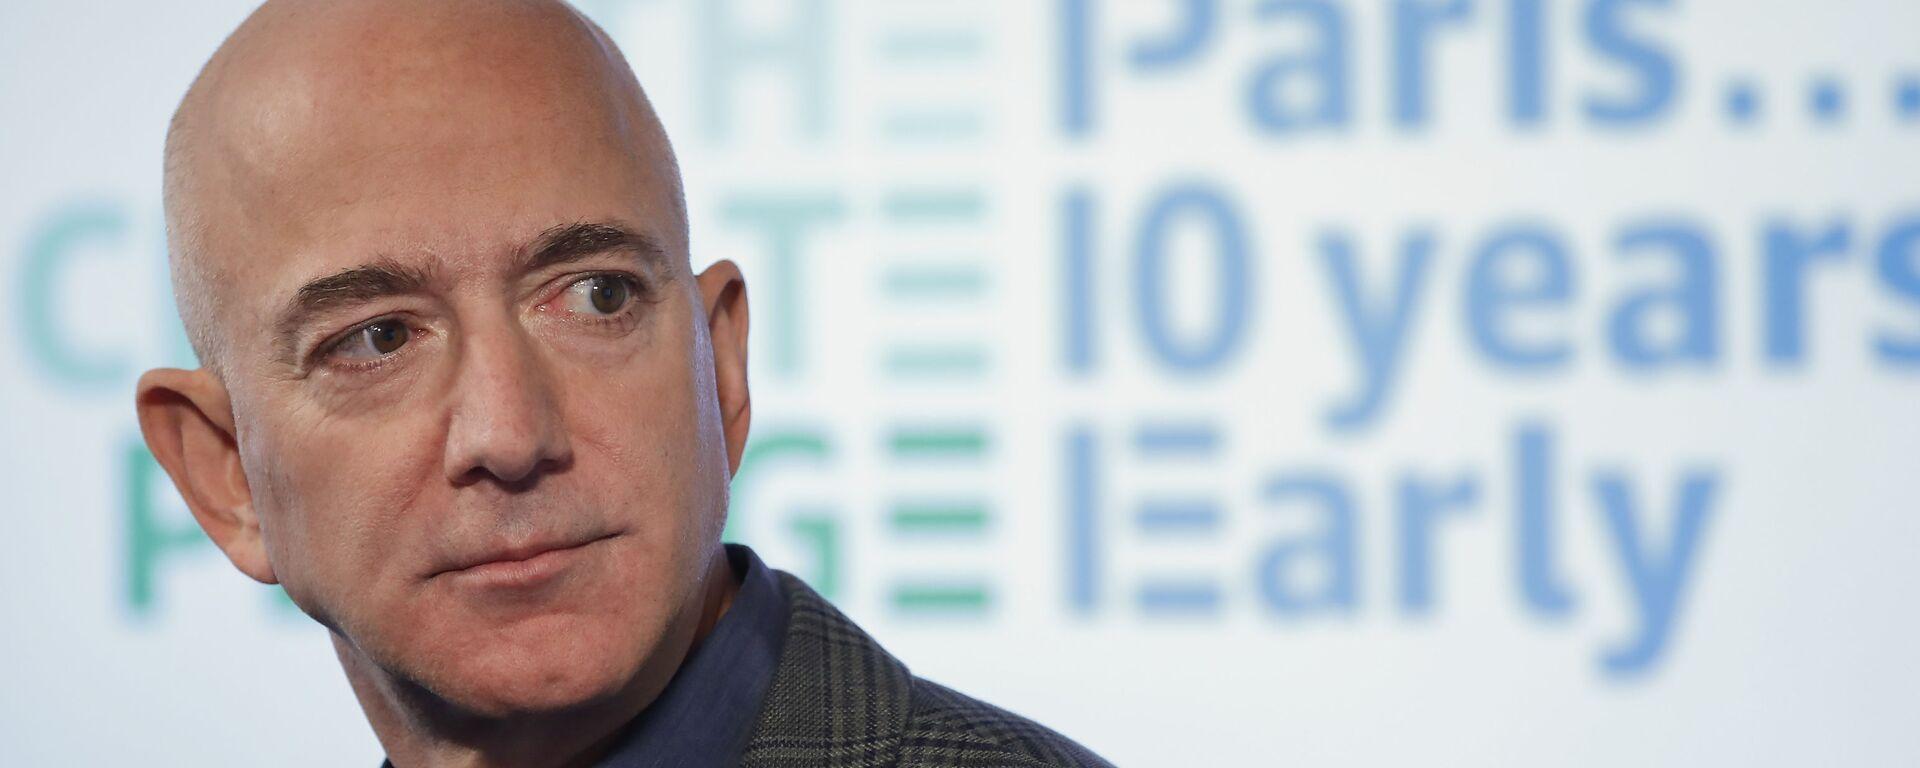 Zakladatel Amazonu Jeff Bezos  - Sputnik Česká republika, 1920, 03.02.2021